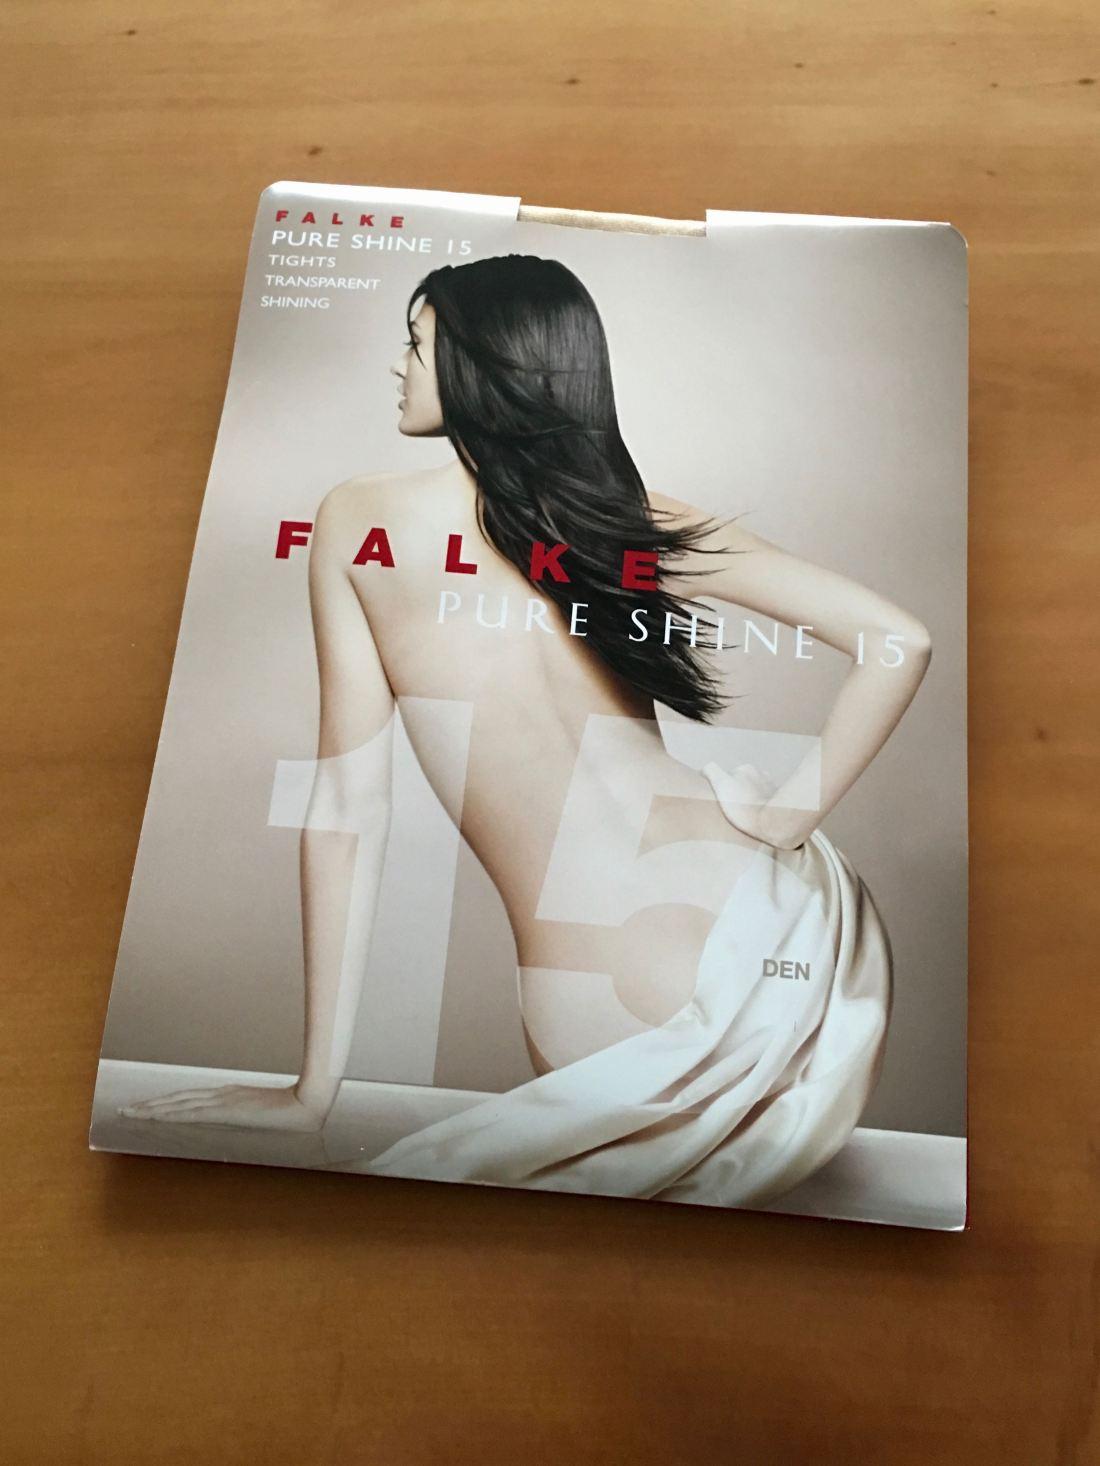 ae85ff164b4 Review  Falke Pure Shine 15 Tights (Updated  25 Apr 19) – i love hosiery